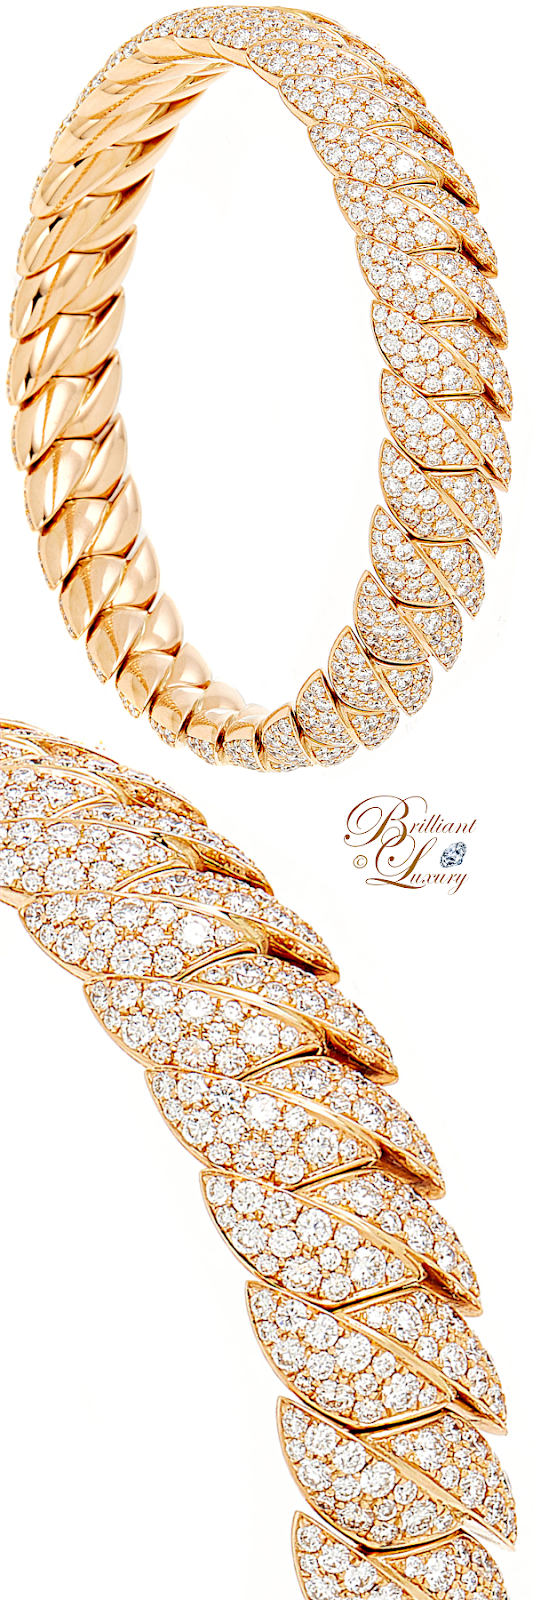 Brilliant Luxury♦Sidney Garber Diamond Skinny Wave Link Bracelet In Rose Gold